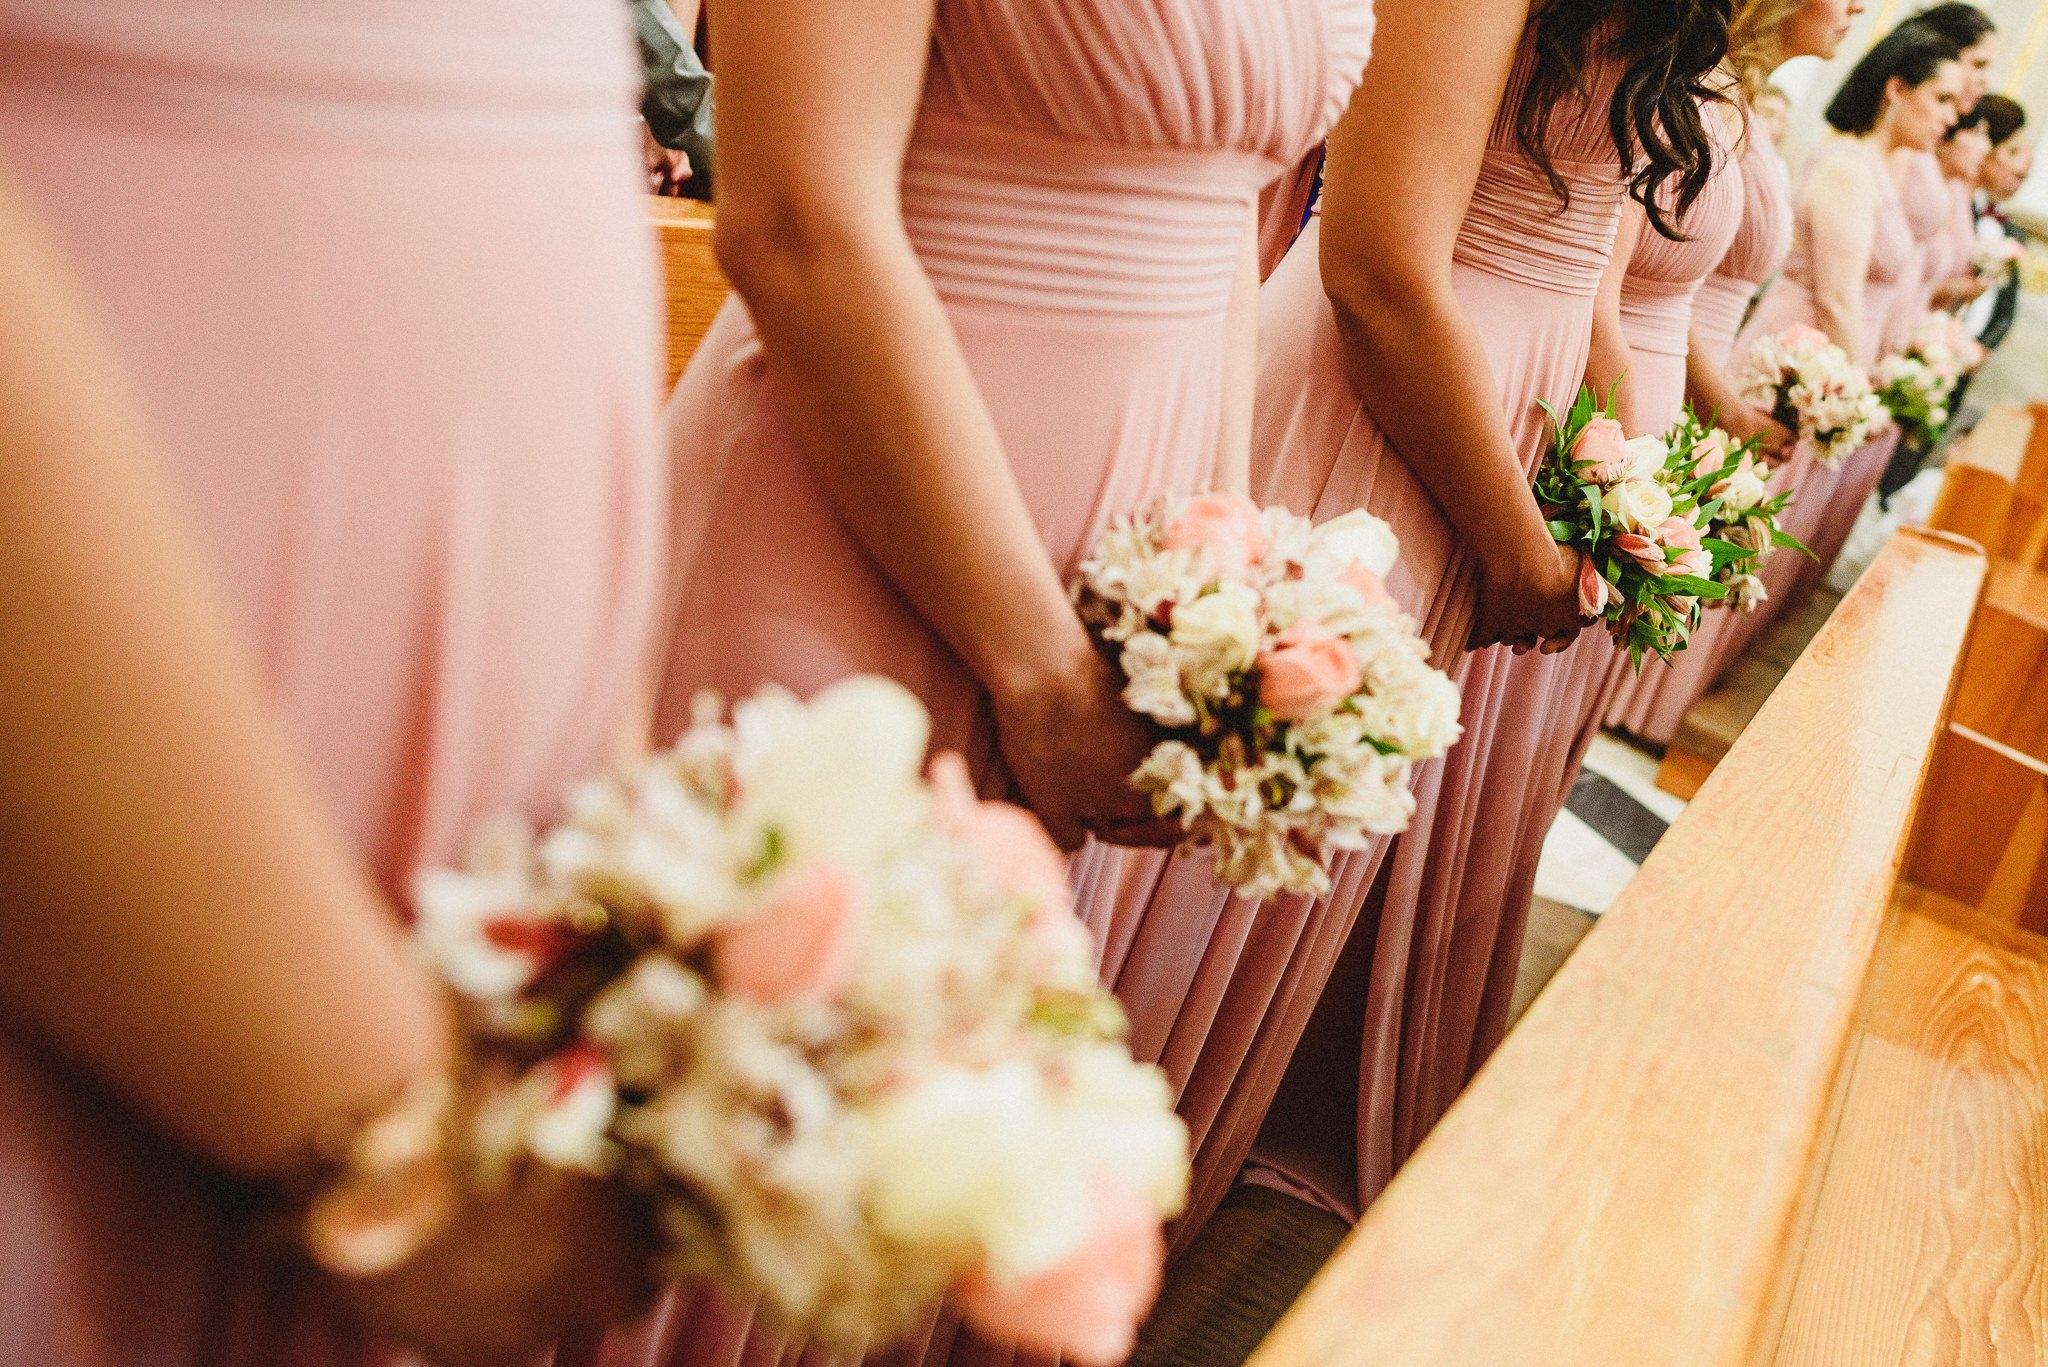 Wedding-Boda-Tulancingo-Hidalgo-Salon-Essenzia-Luis-Houdin-21-film